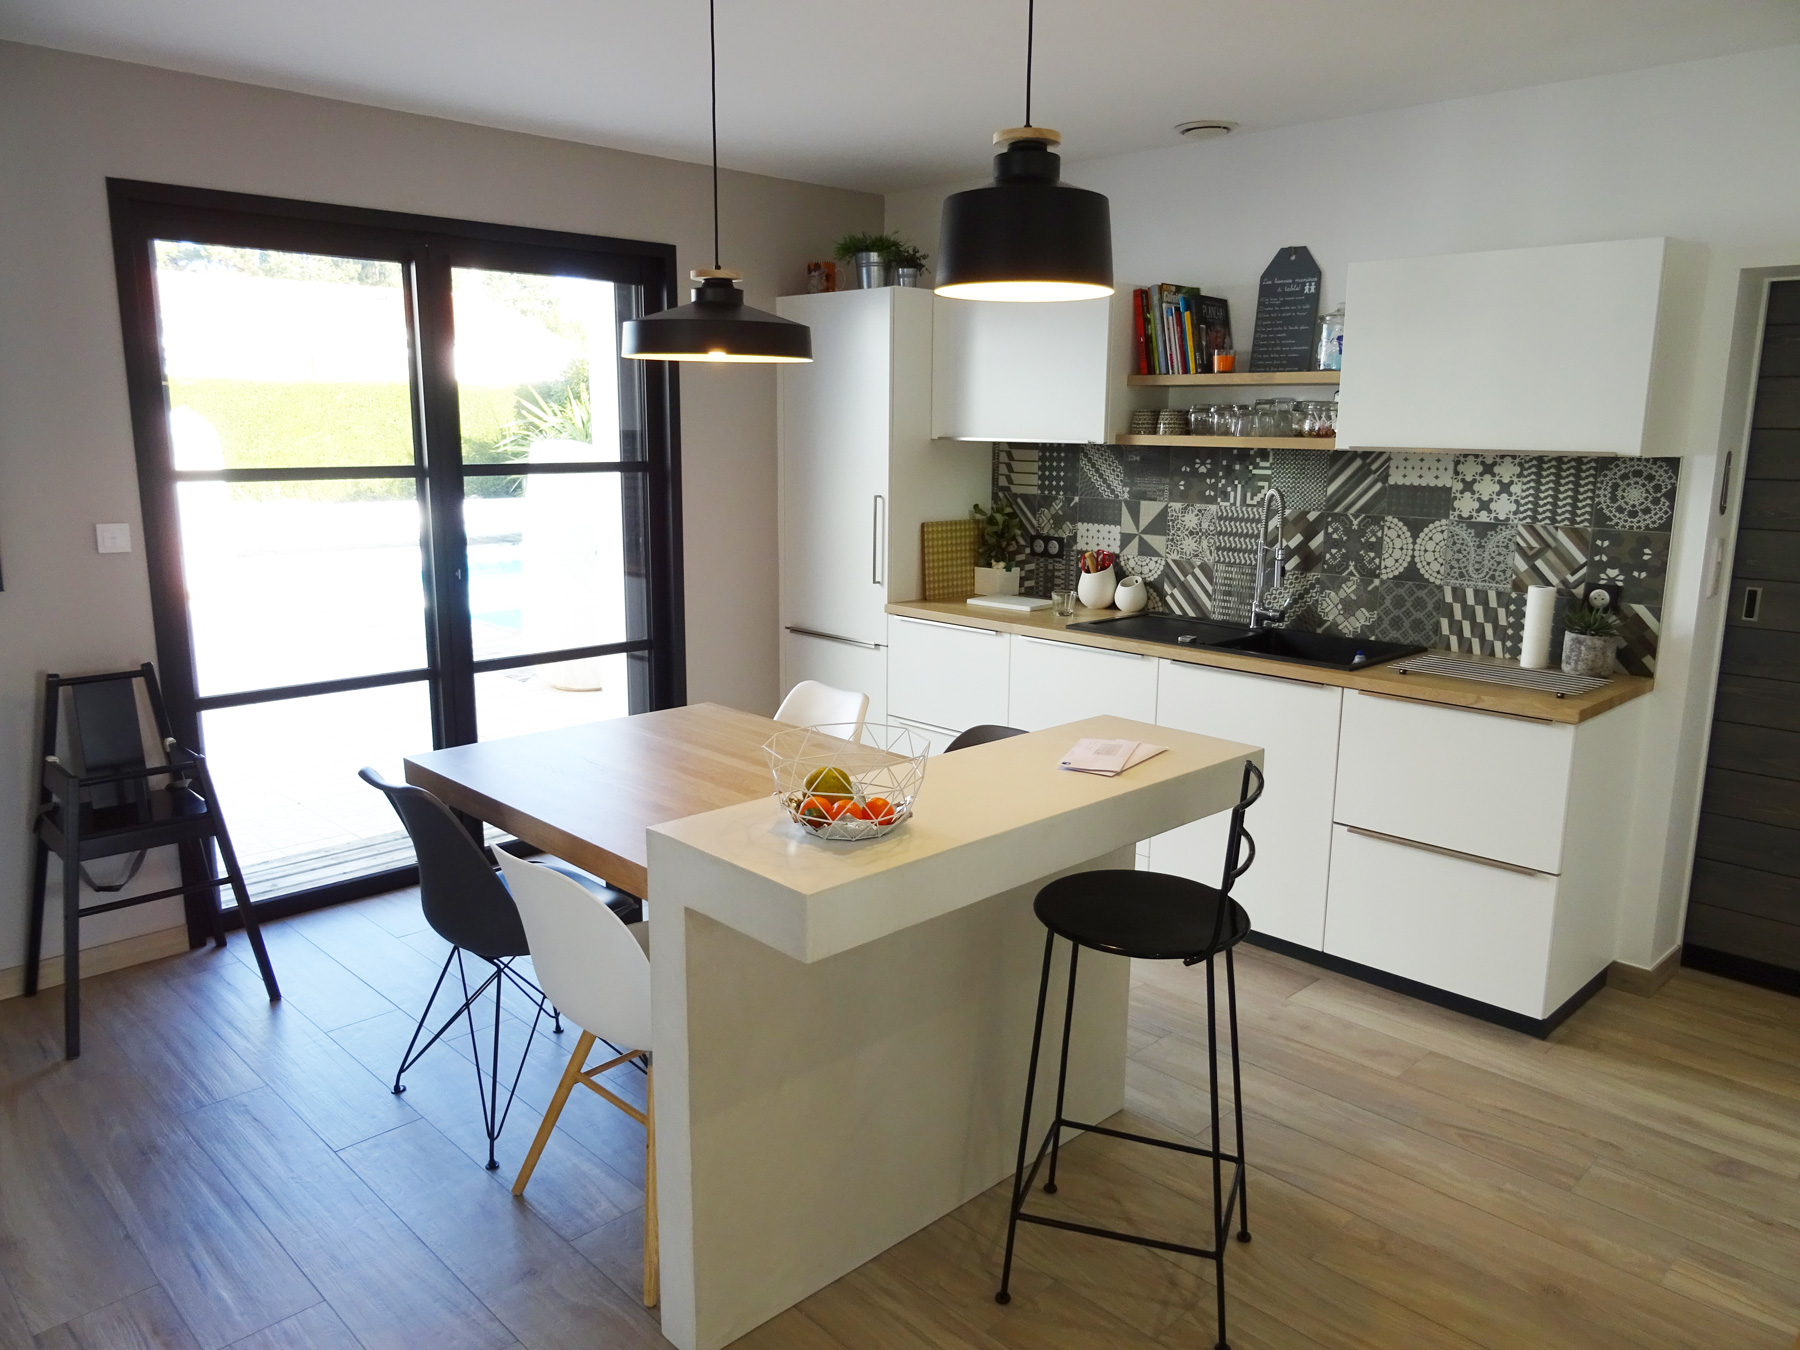 fabricant de meubles de cuisine sur mesure 49. Black Bedroom Furniture Sets. Home Design Ideas